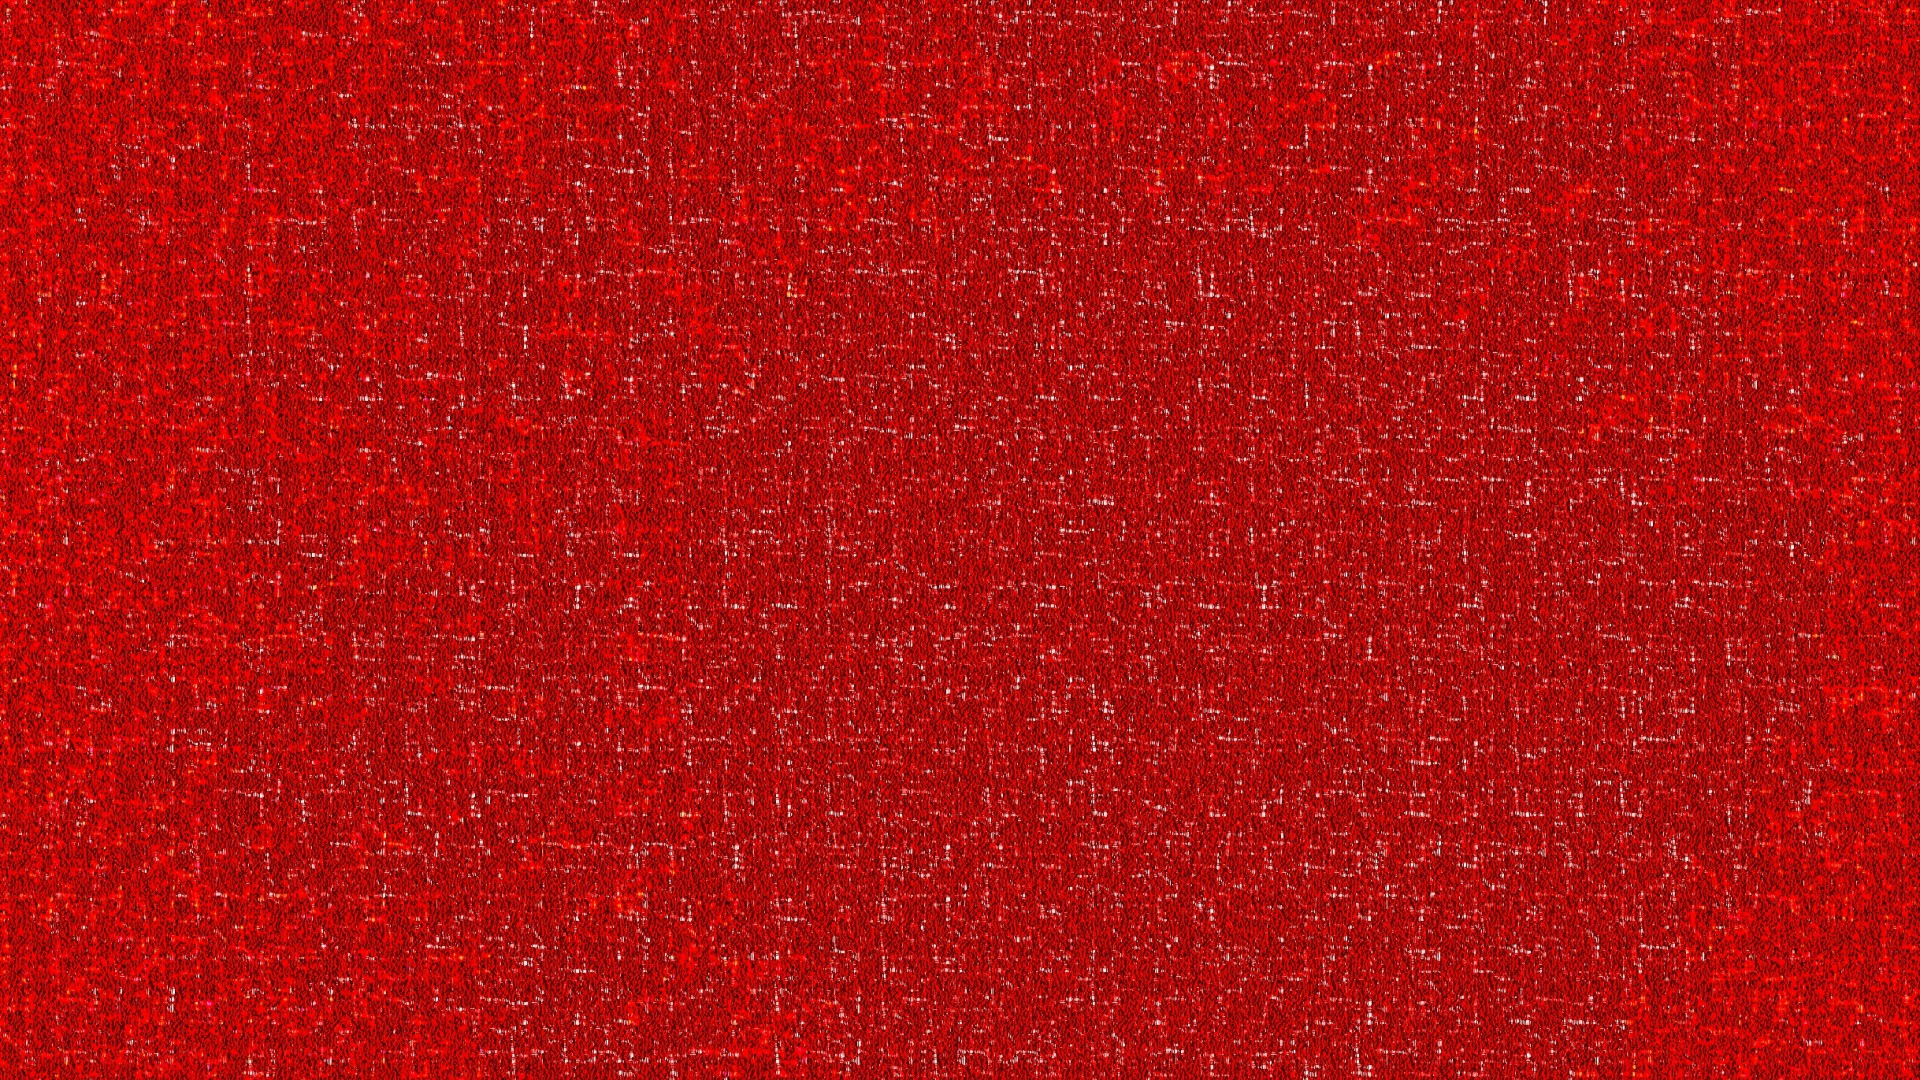 Red denim background patternreddesigncolorful roof tiles 1920x1080